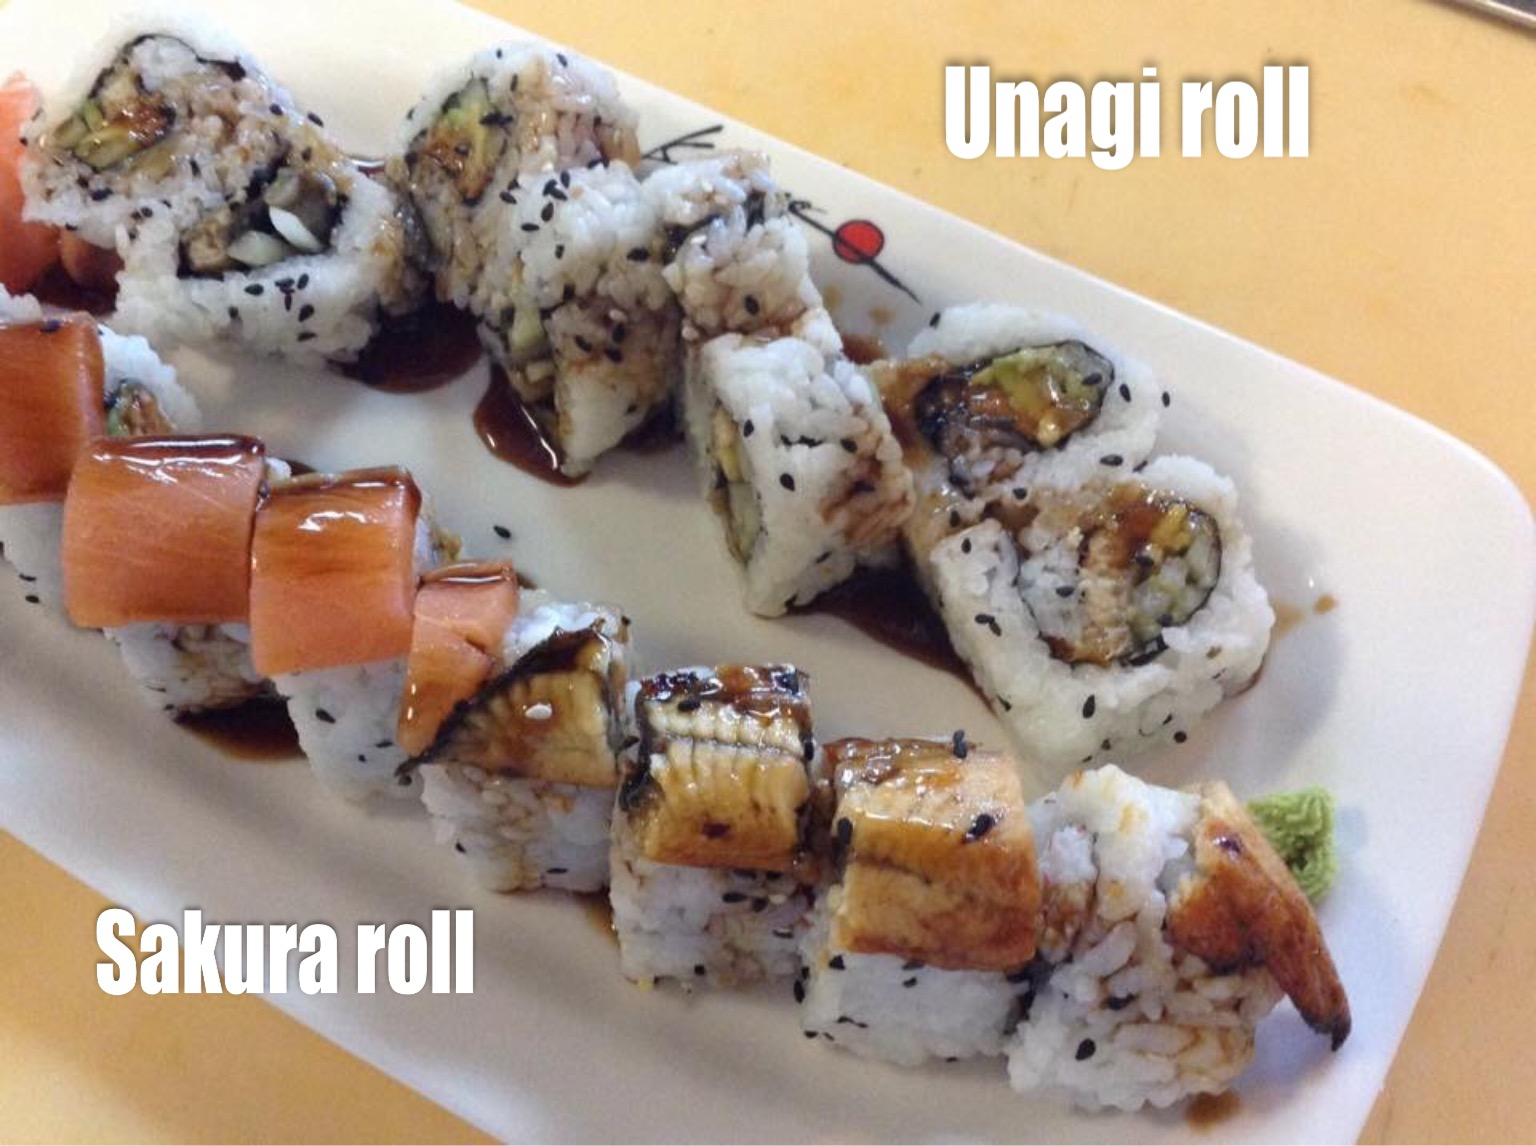 Unagi Roll Image